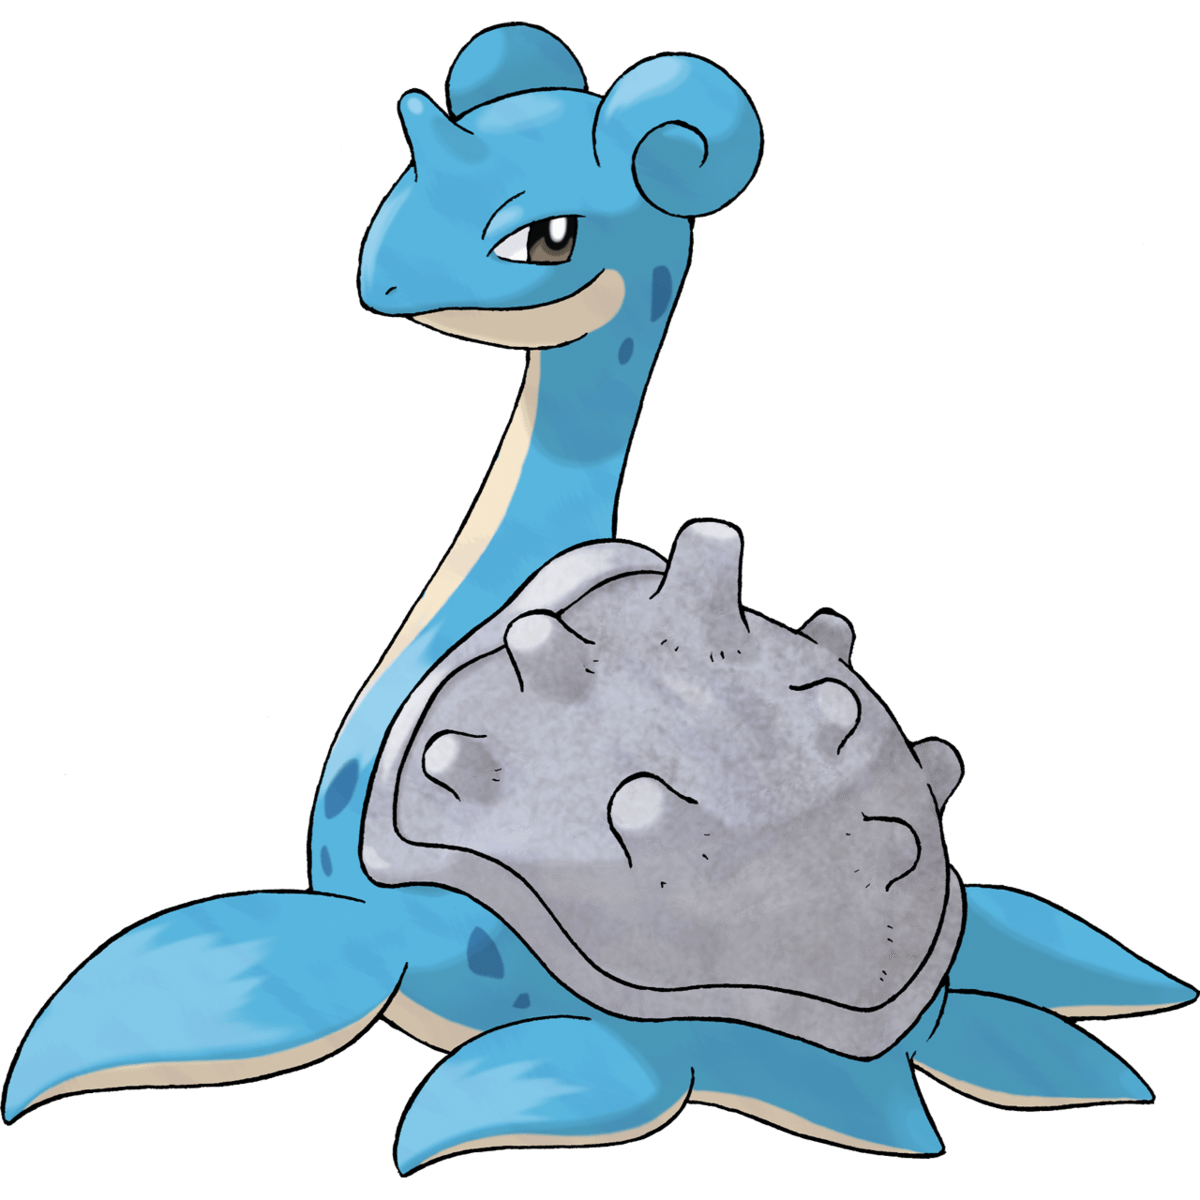 Lapras, one of the best Water type Pokemon in Pokemon Let's Go